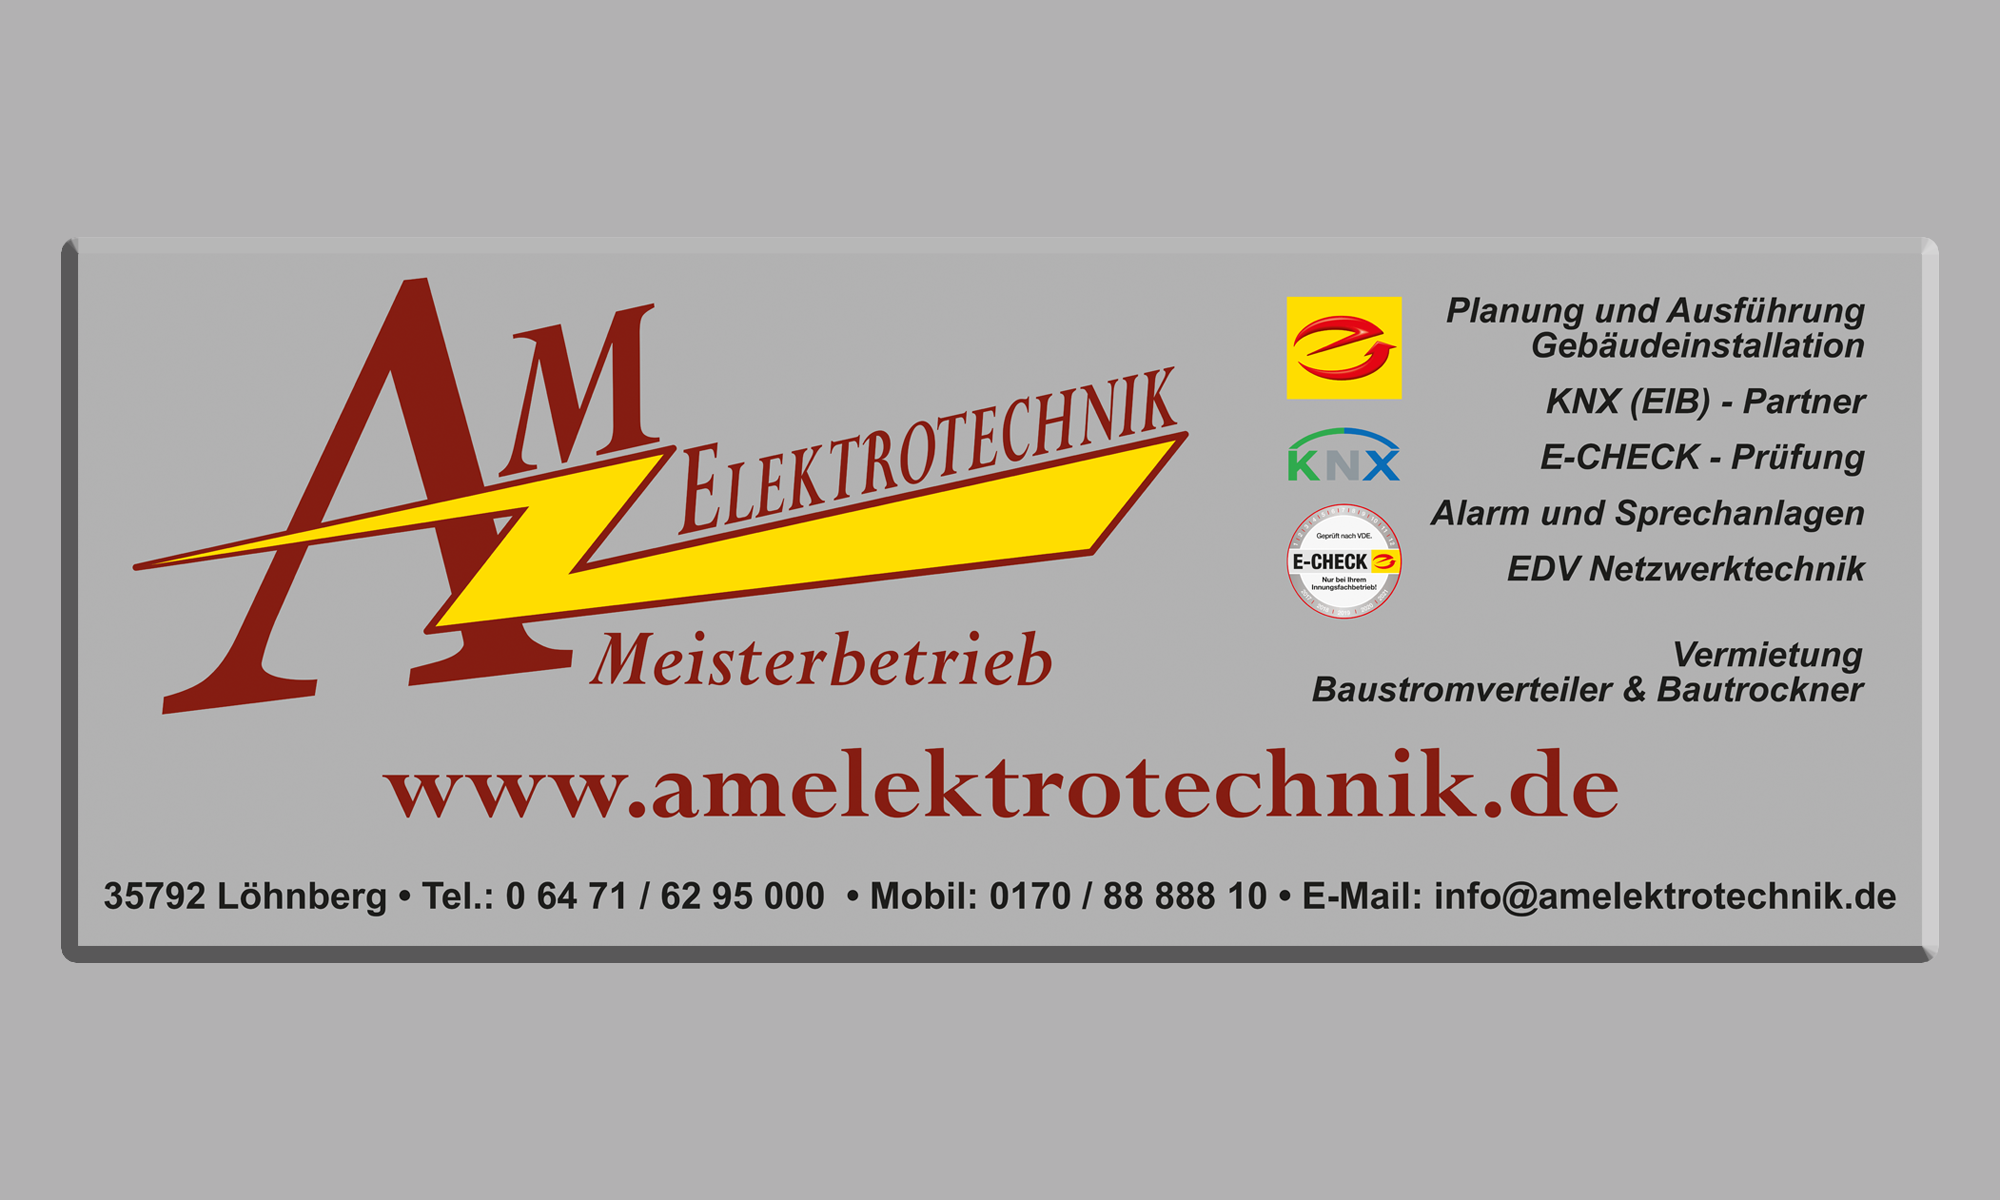 AM Elektrotechnik